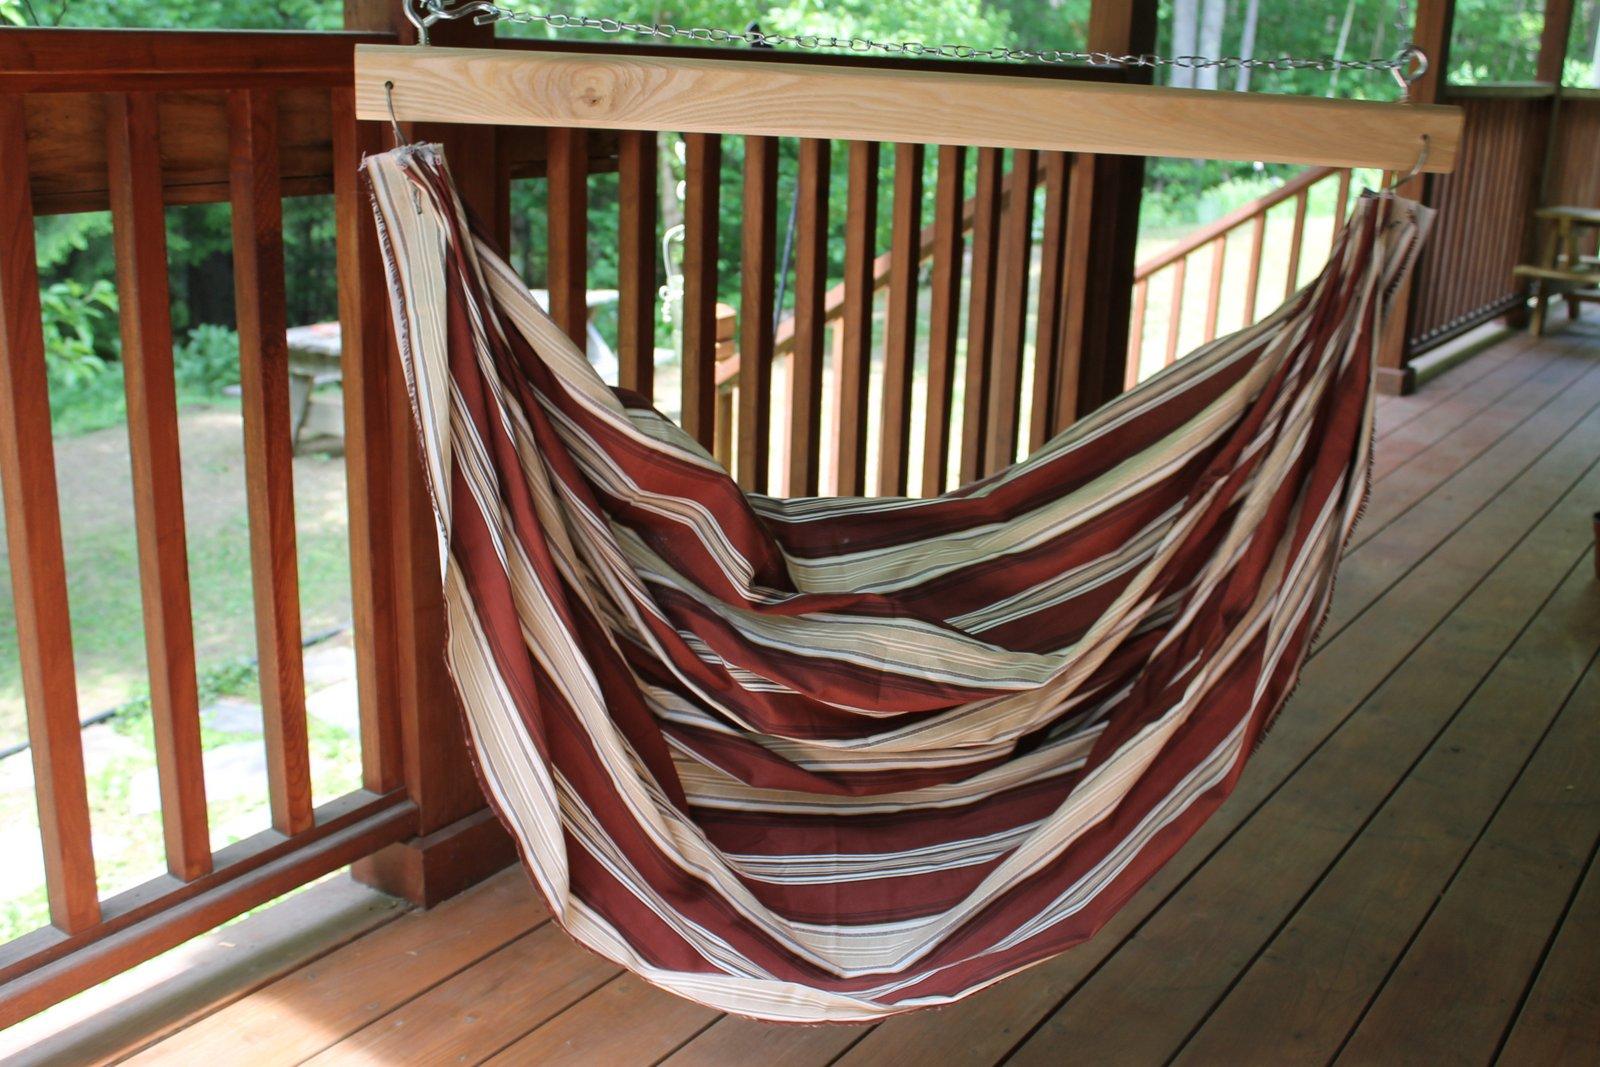 hammock chair instructions with ottoman india born imaginative mama made child 39s brazilian